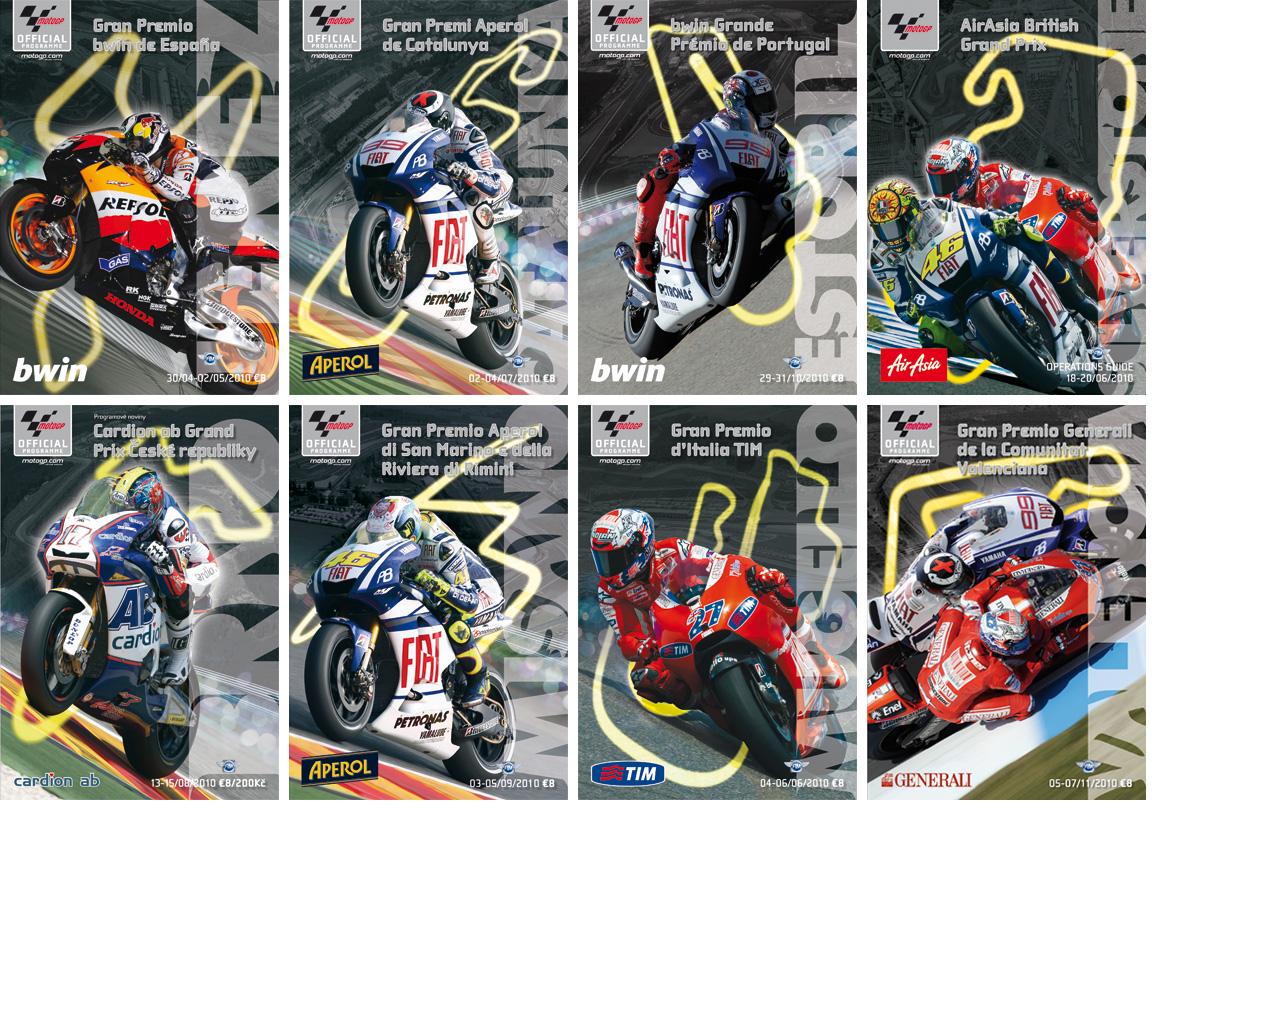 MotoGP2010_8Covers